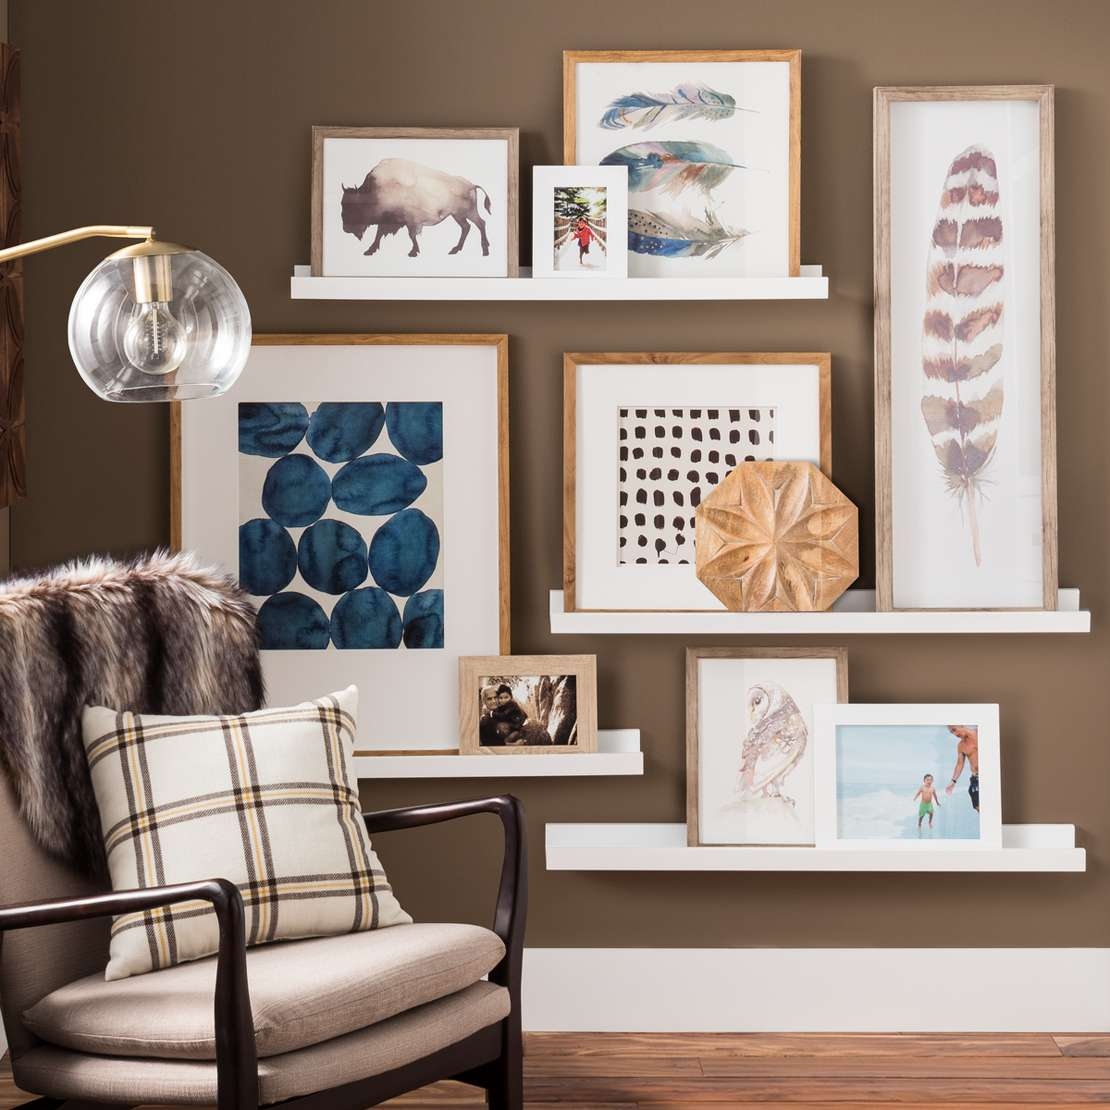 Gallery Wall Ideas Target